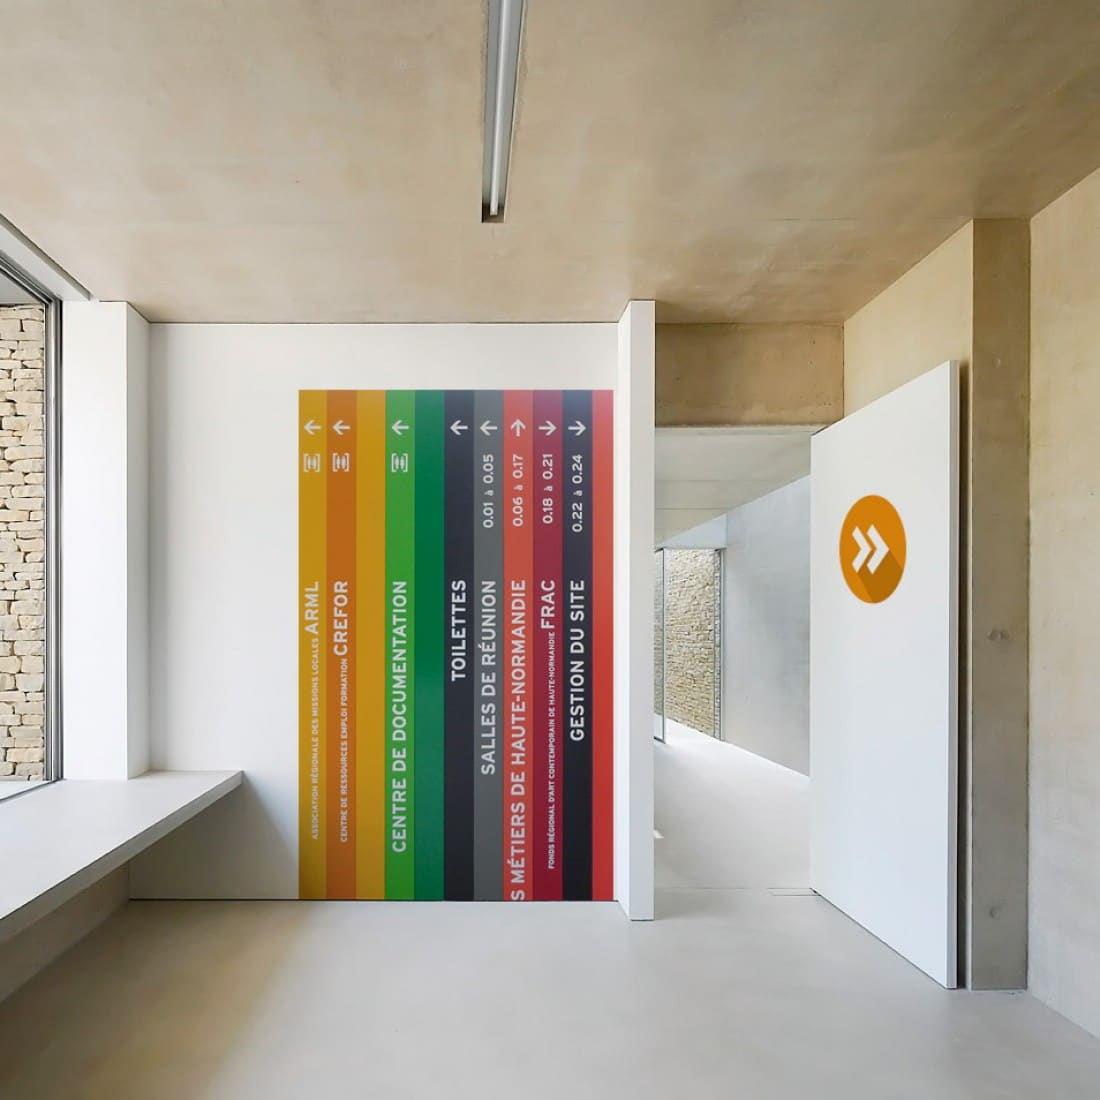 Adesivi stampati per superfici liscie e pareti for Adesivi per parete